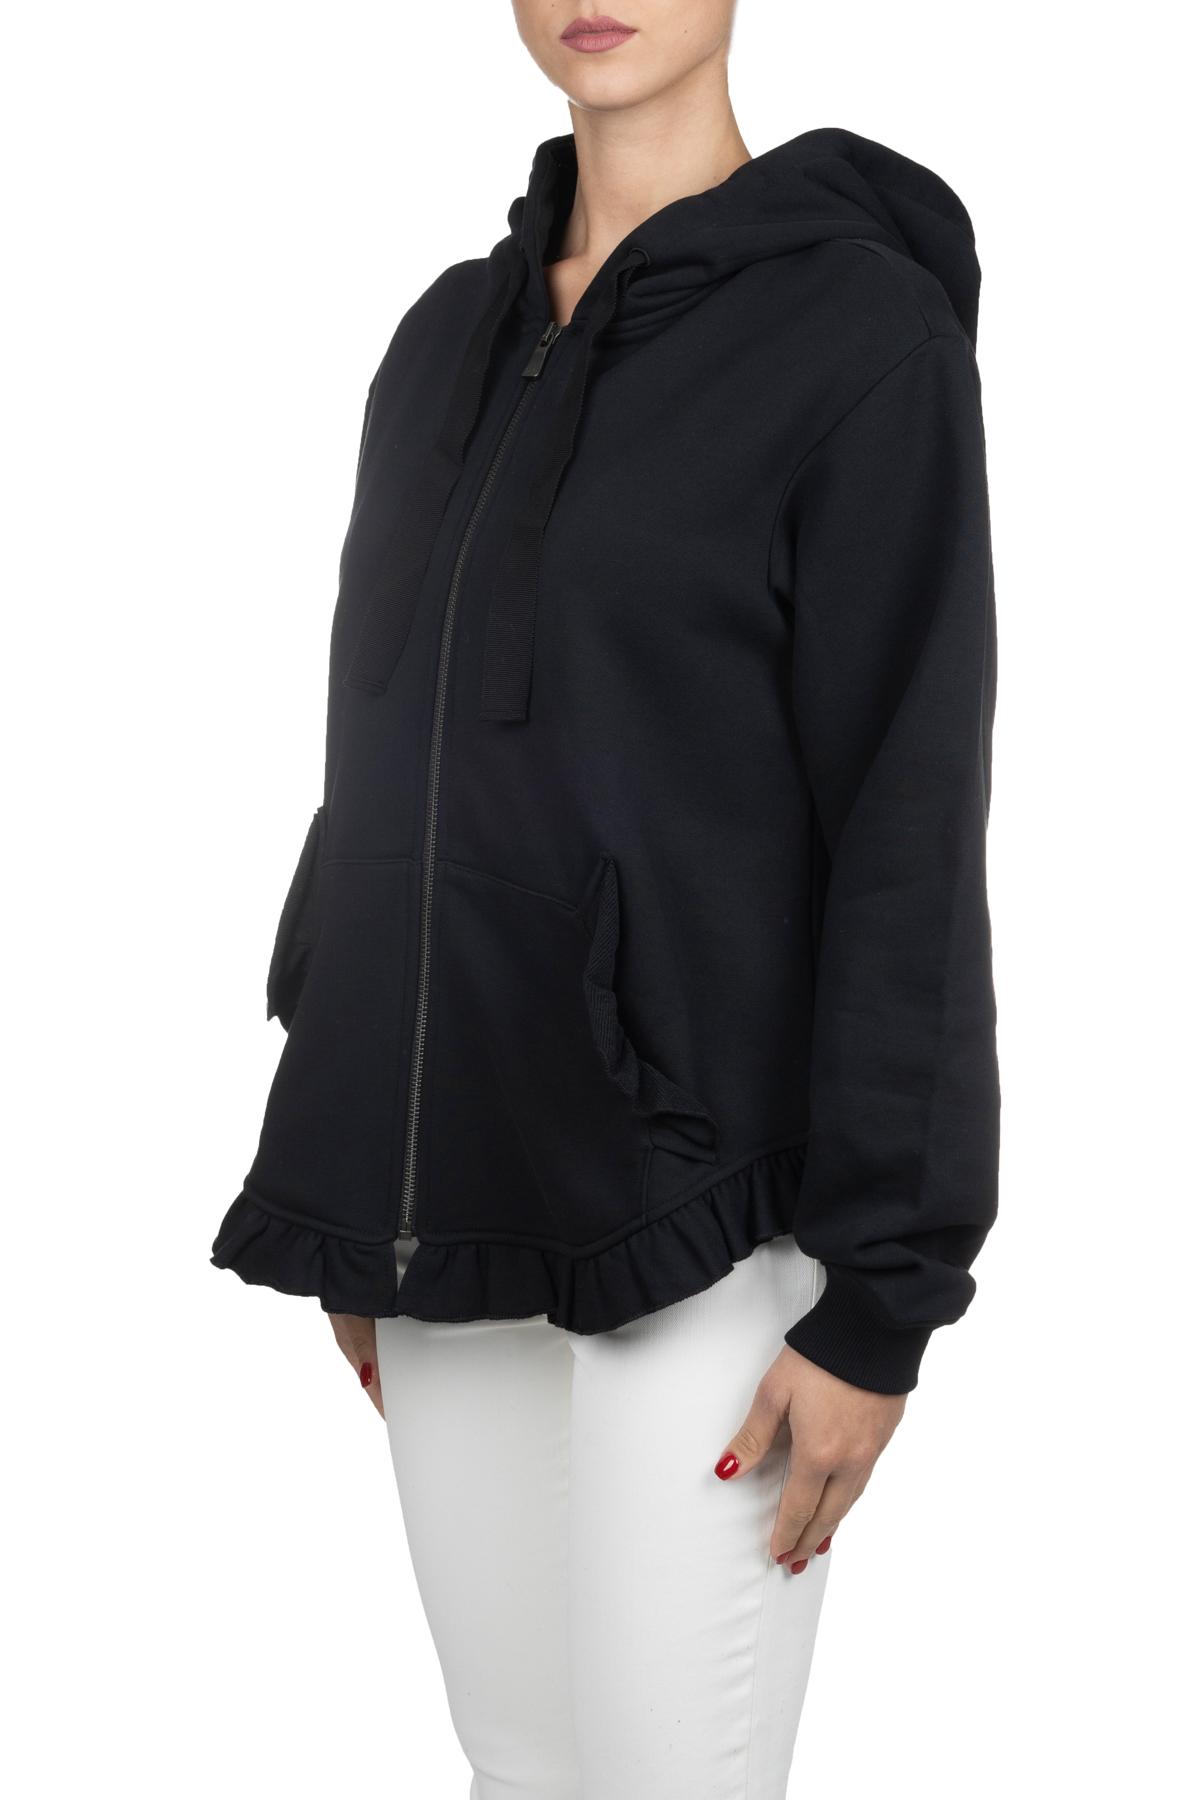 BLACK COTTON SWEATSHIRT WITH RETRO LOGO PRINT BOUTIQUE MOSCHINO | Sweatshirts | 170261252555